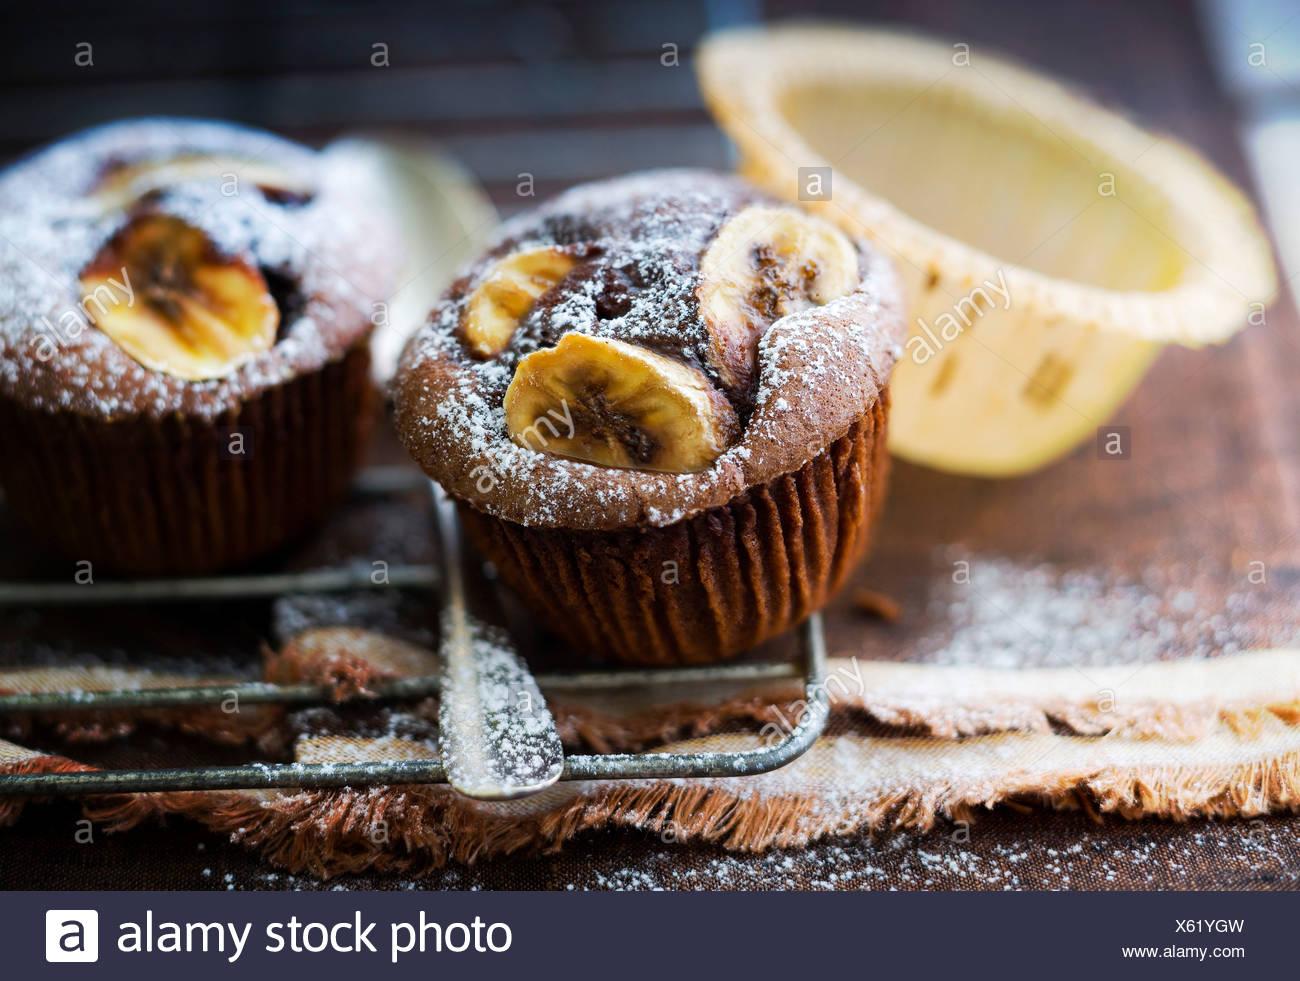 Banana and chocolate muffins - Stock Image